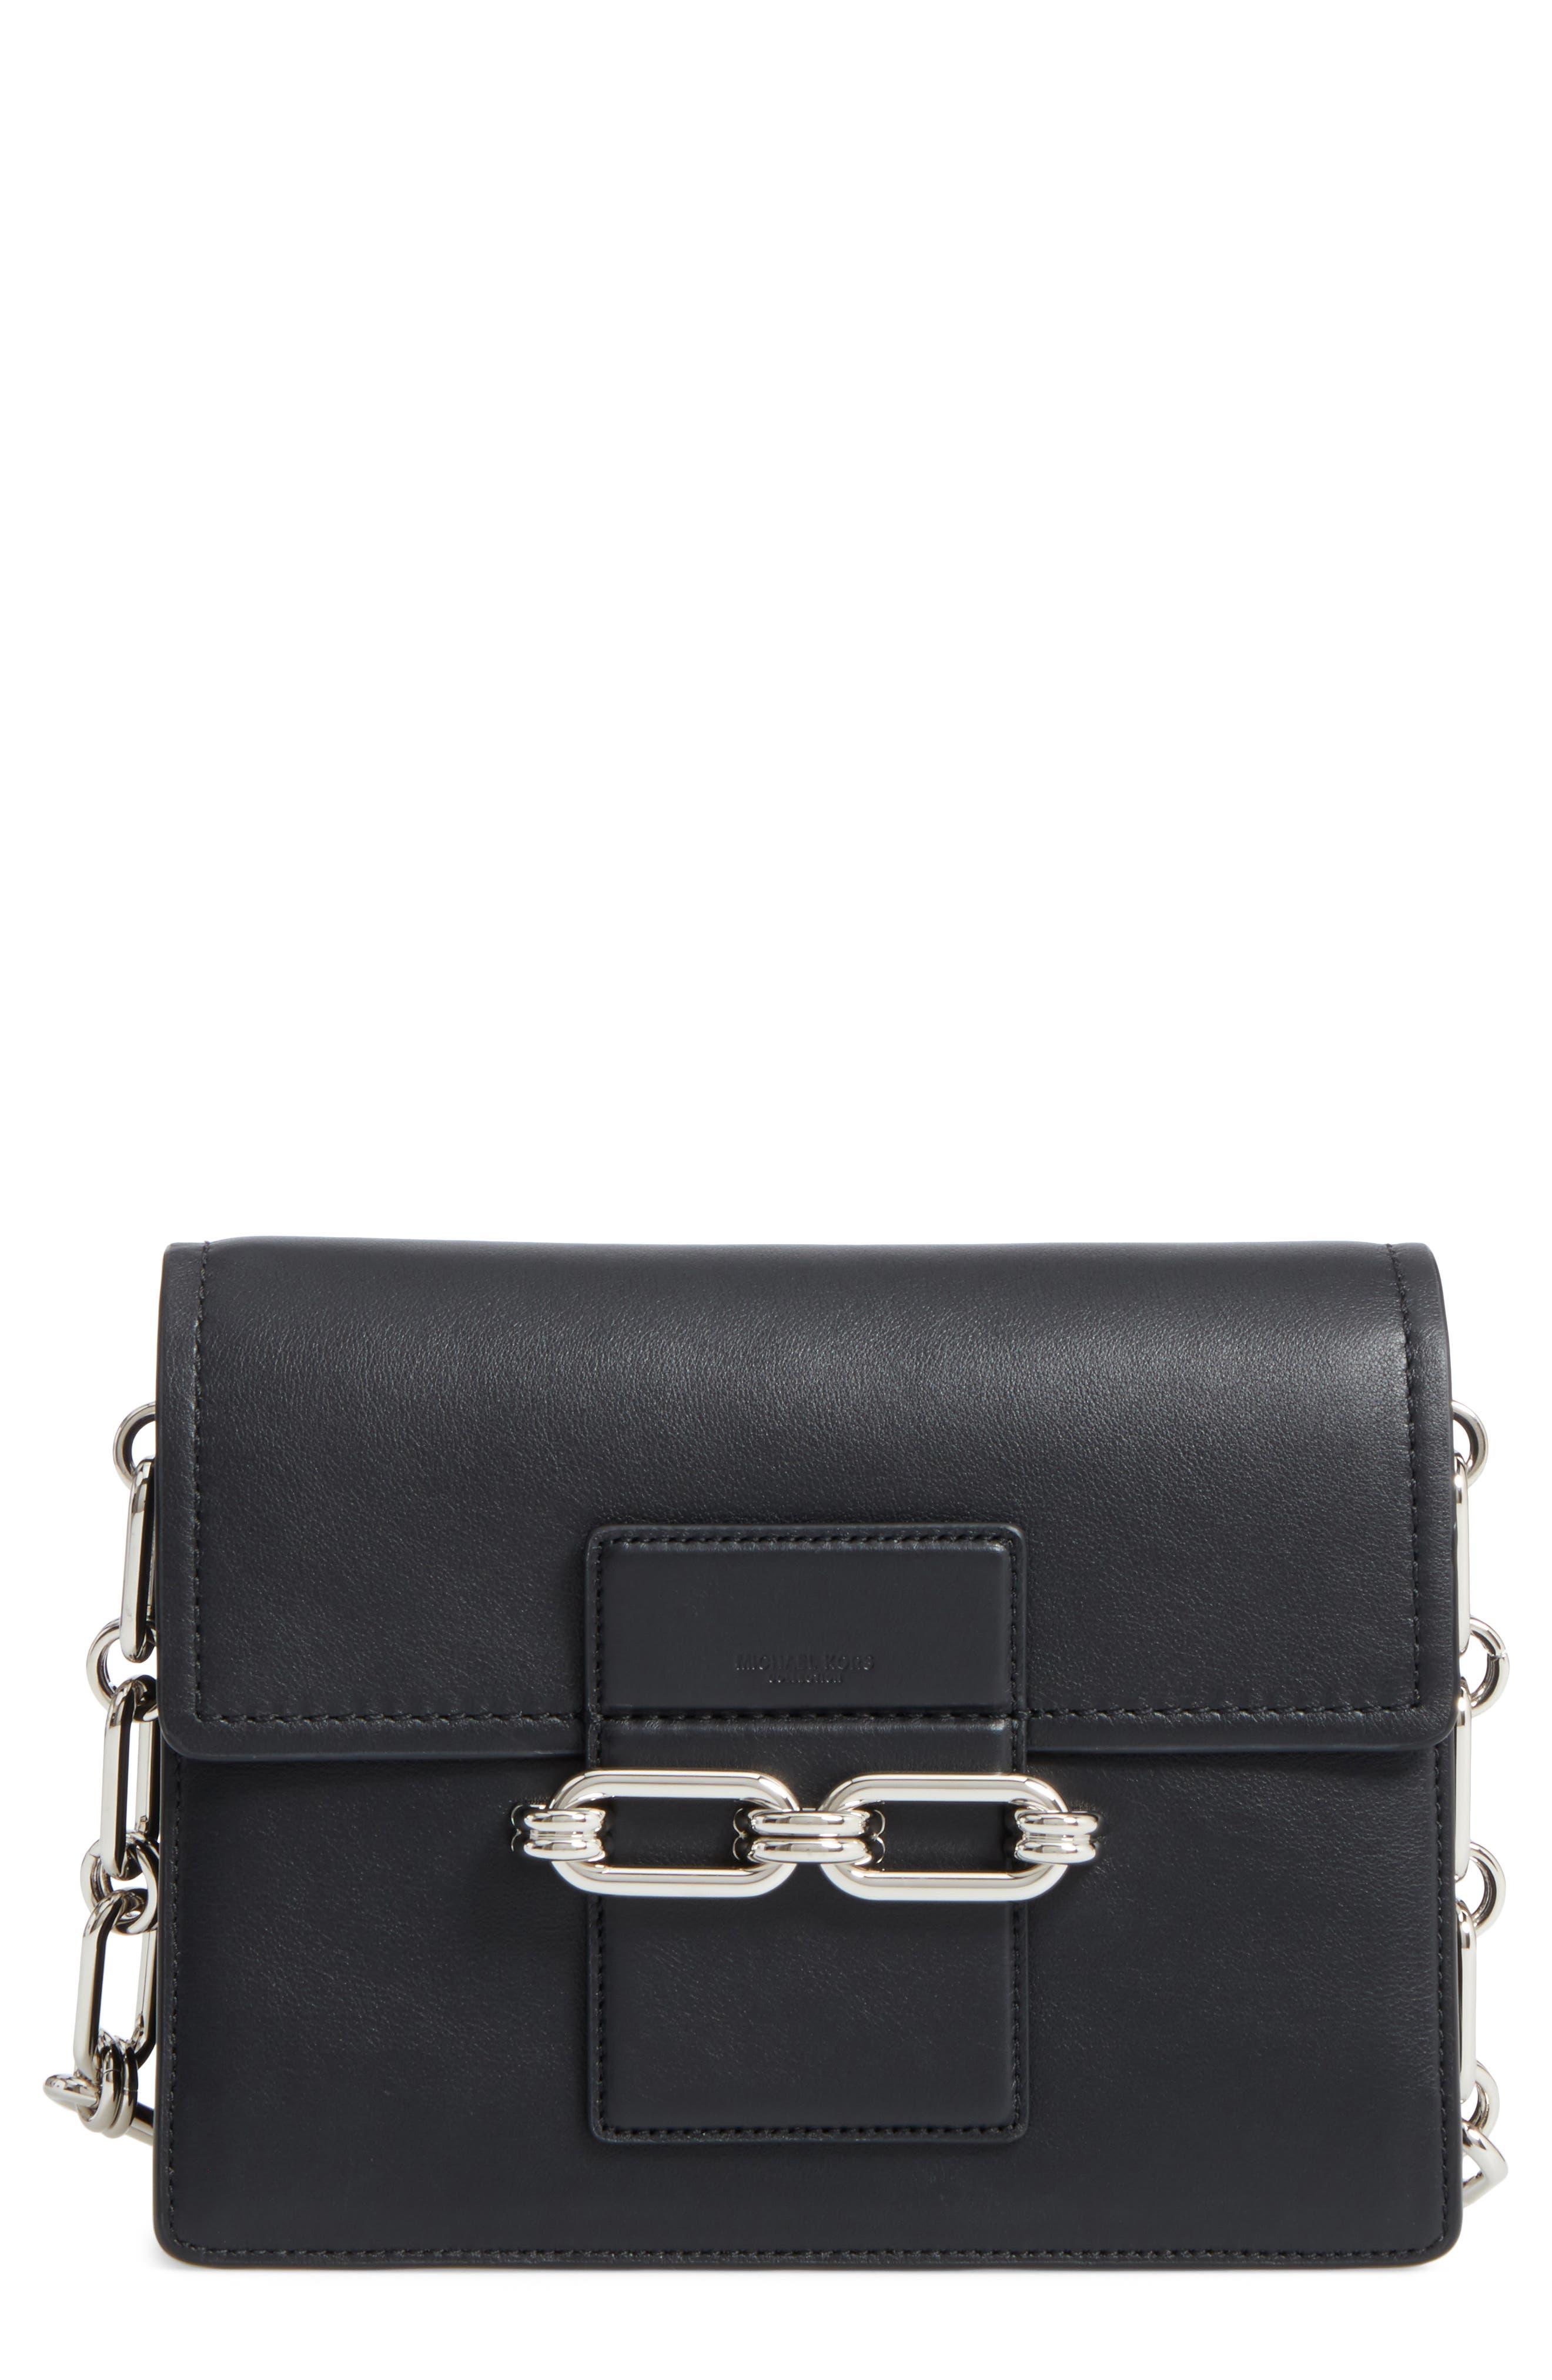 Medium Shoulder Bag,                         Main,                         color, Black